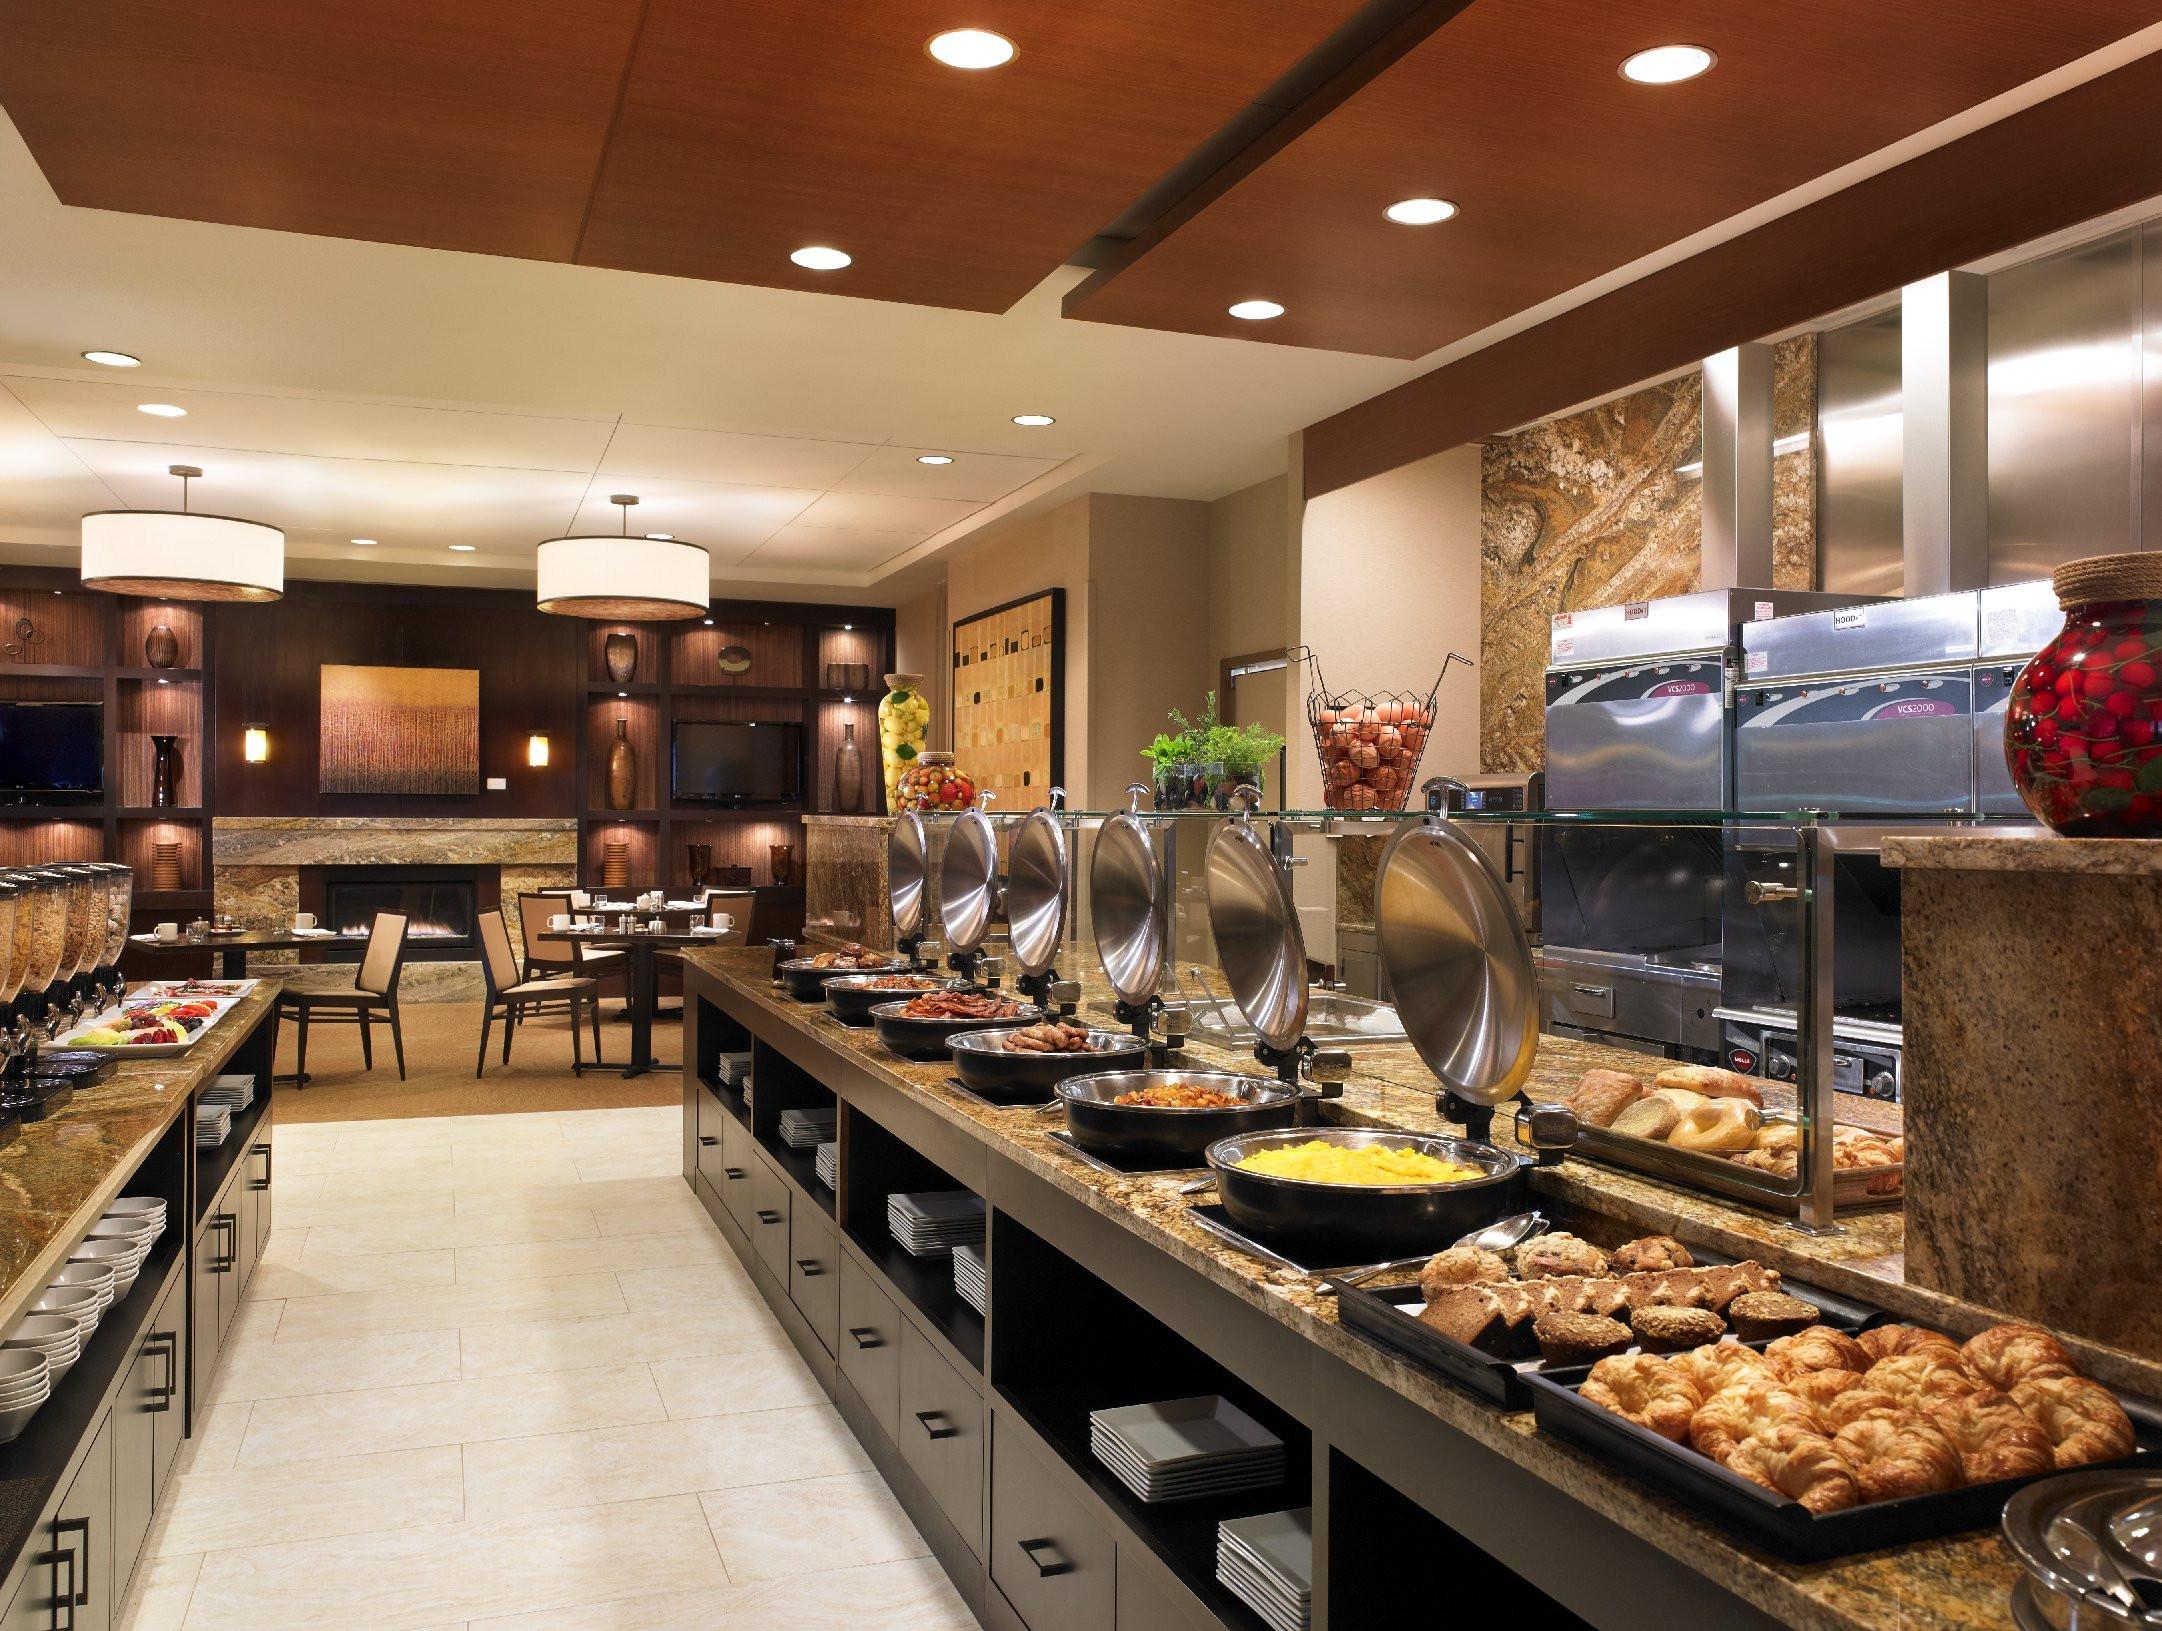 Thanksgiving Breakfast Restaurants  Restaurants that Serve Thanksgiving Dinner in Seattle